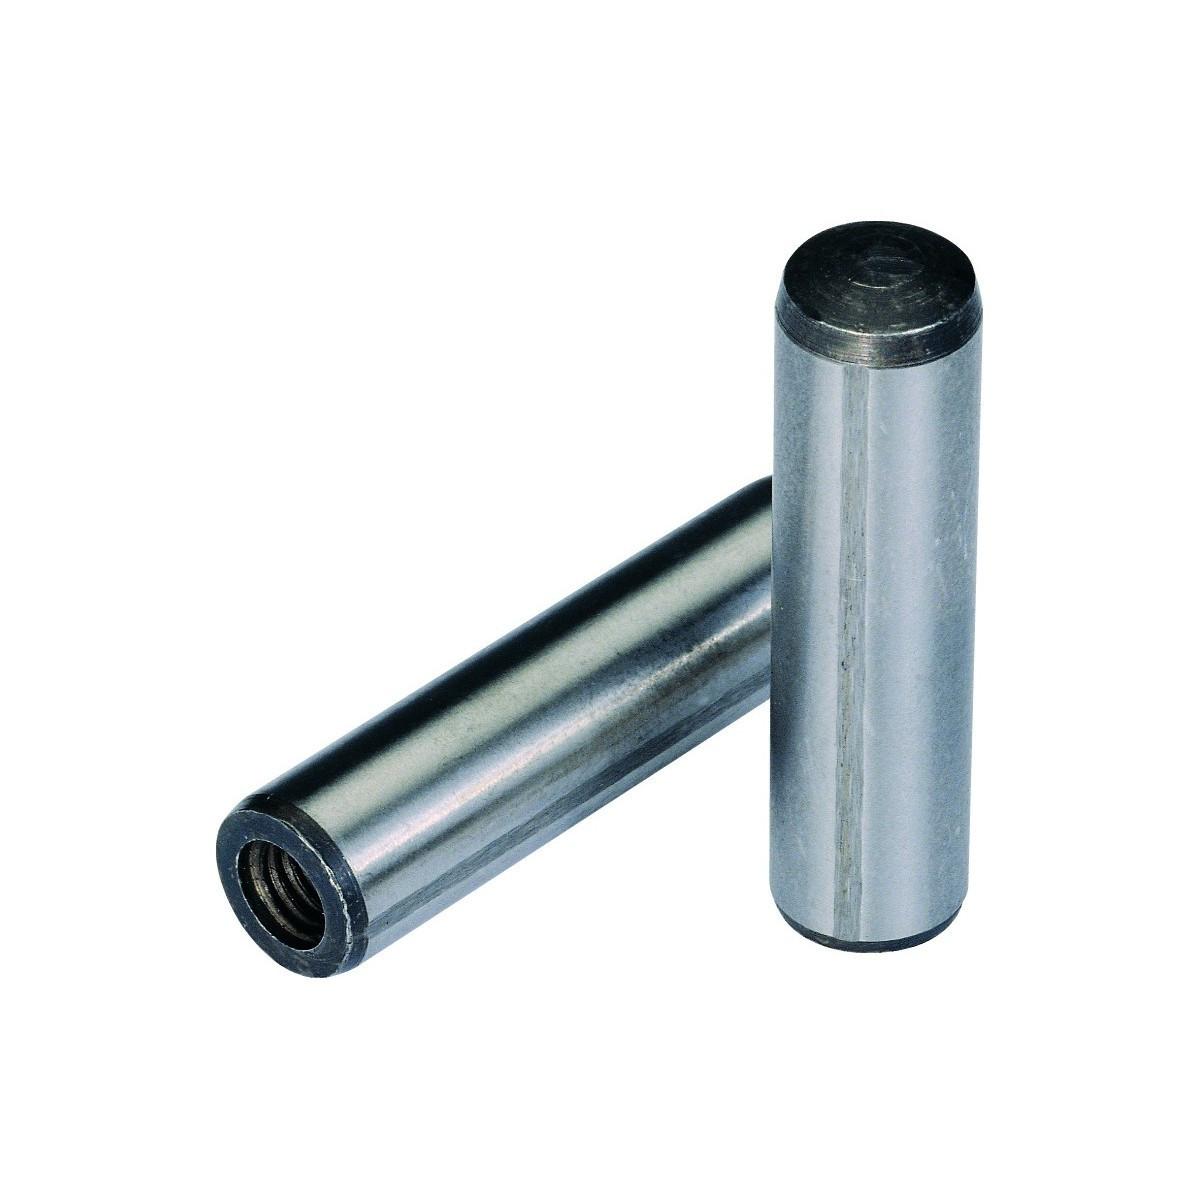 Штифт цилиндрический MMG  DIN 7979D M10 х 50 Класс 10.9 (Фосфат) 1 шт